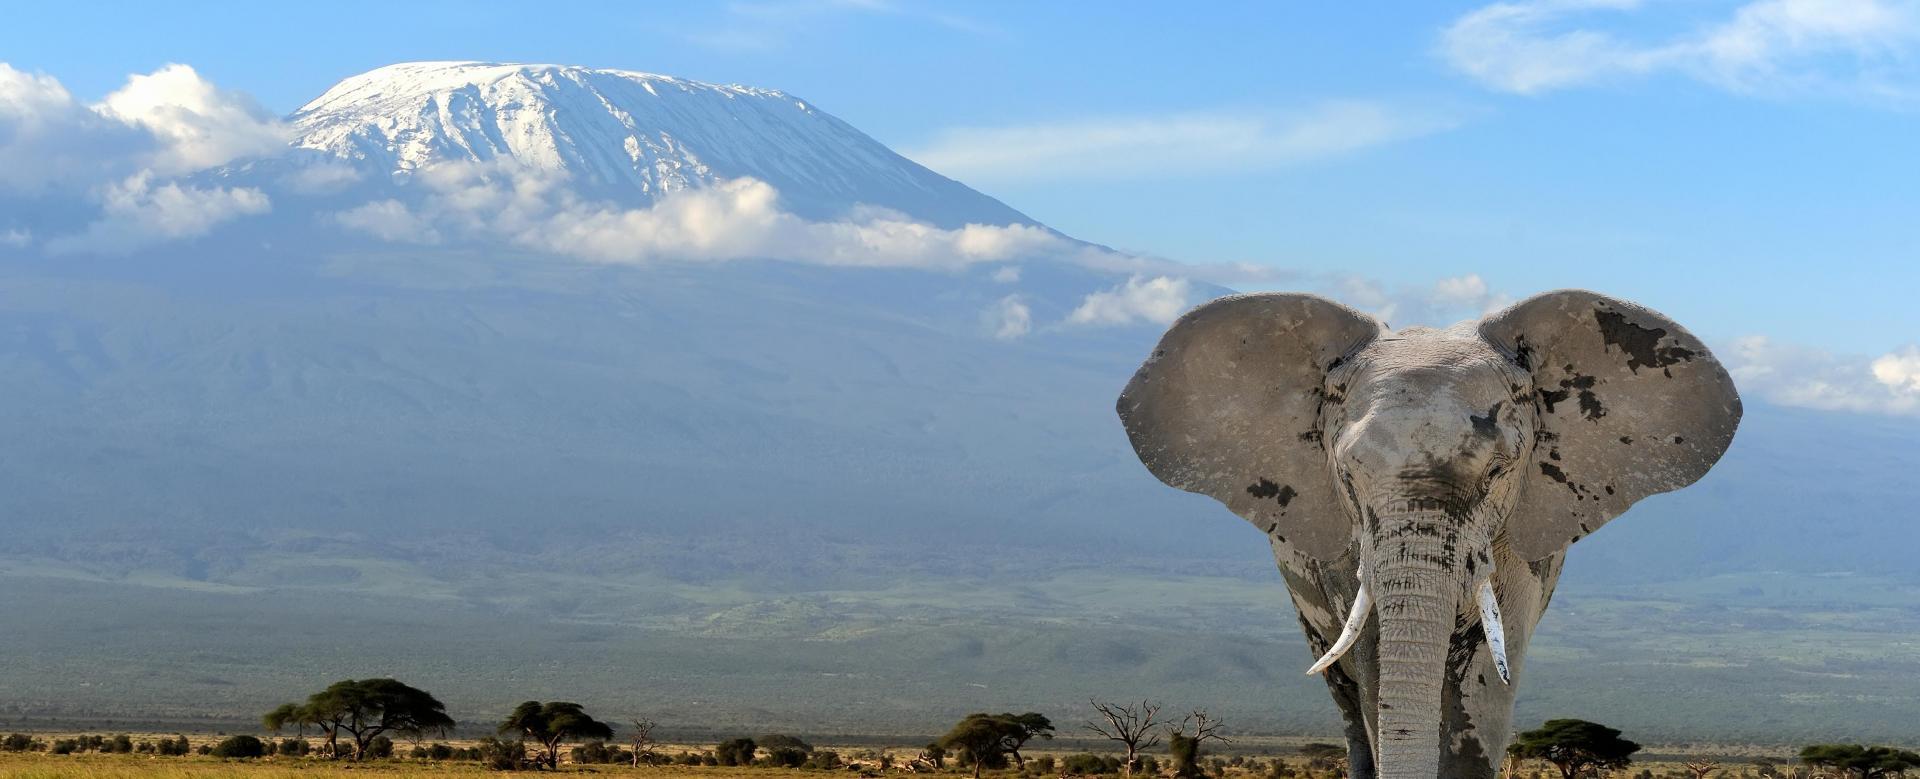 Voyage à pied : Kilimandjaro : voie machame et big five